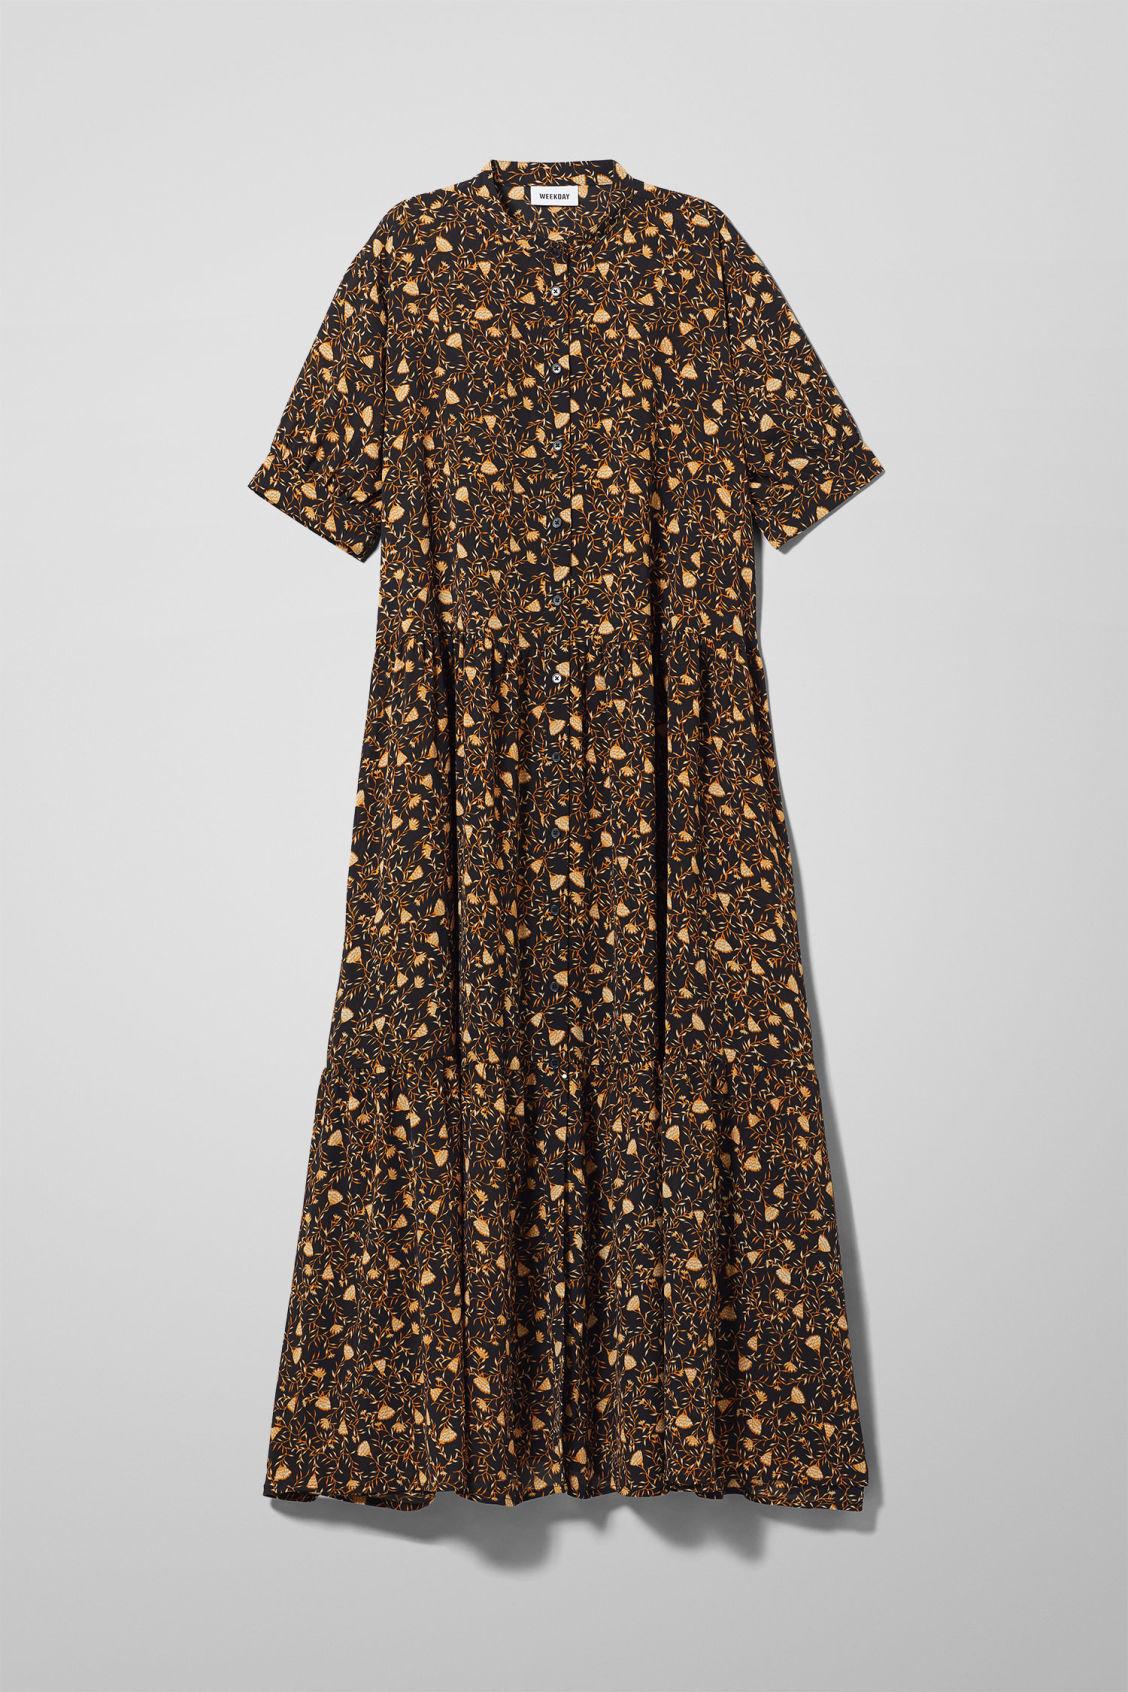 Image of Storm Dress - Black-M